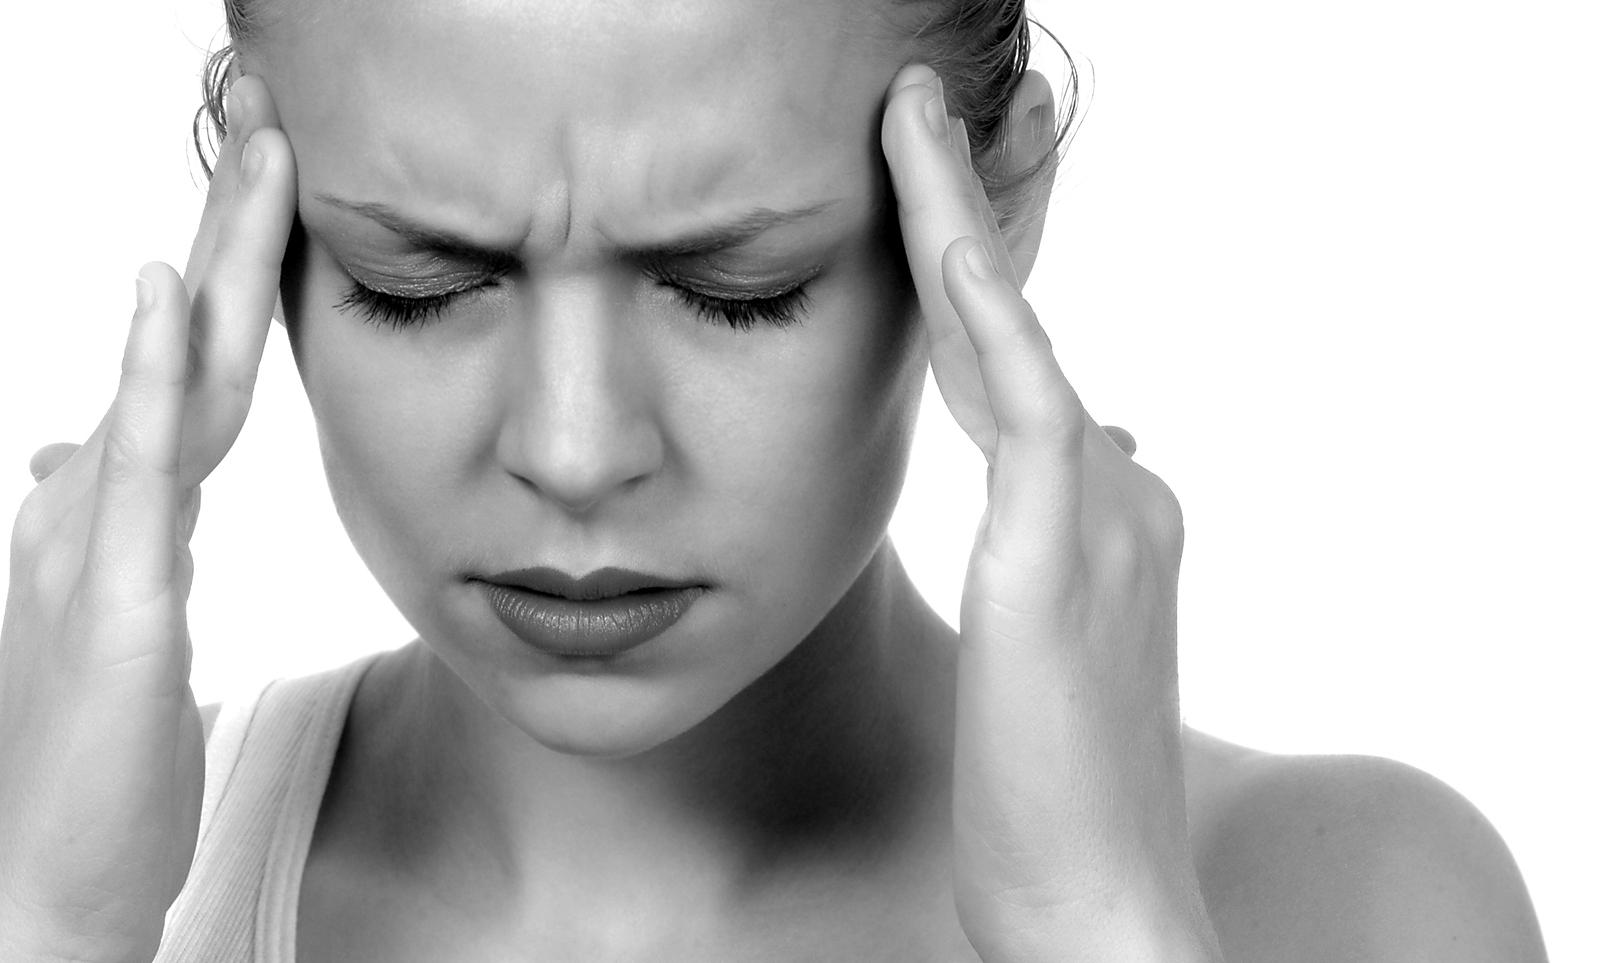 Alarming study: Migraines in women increase risk of cardiovascular disease